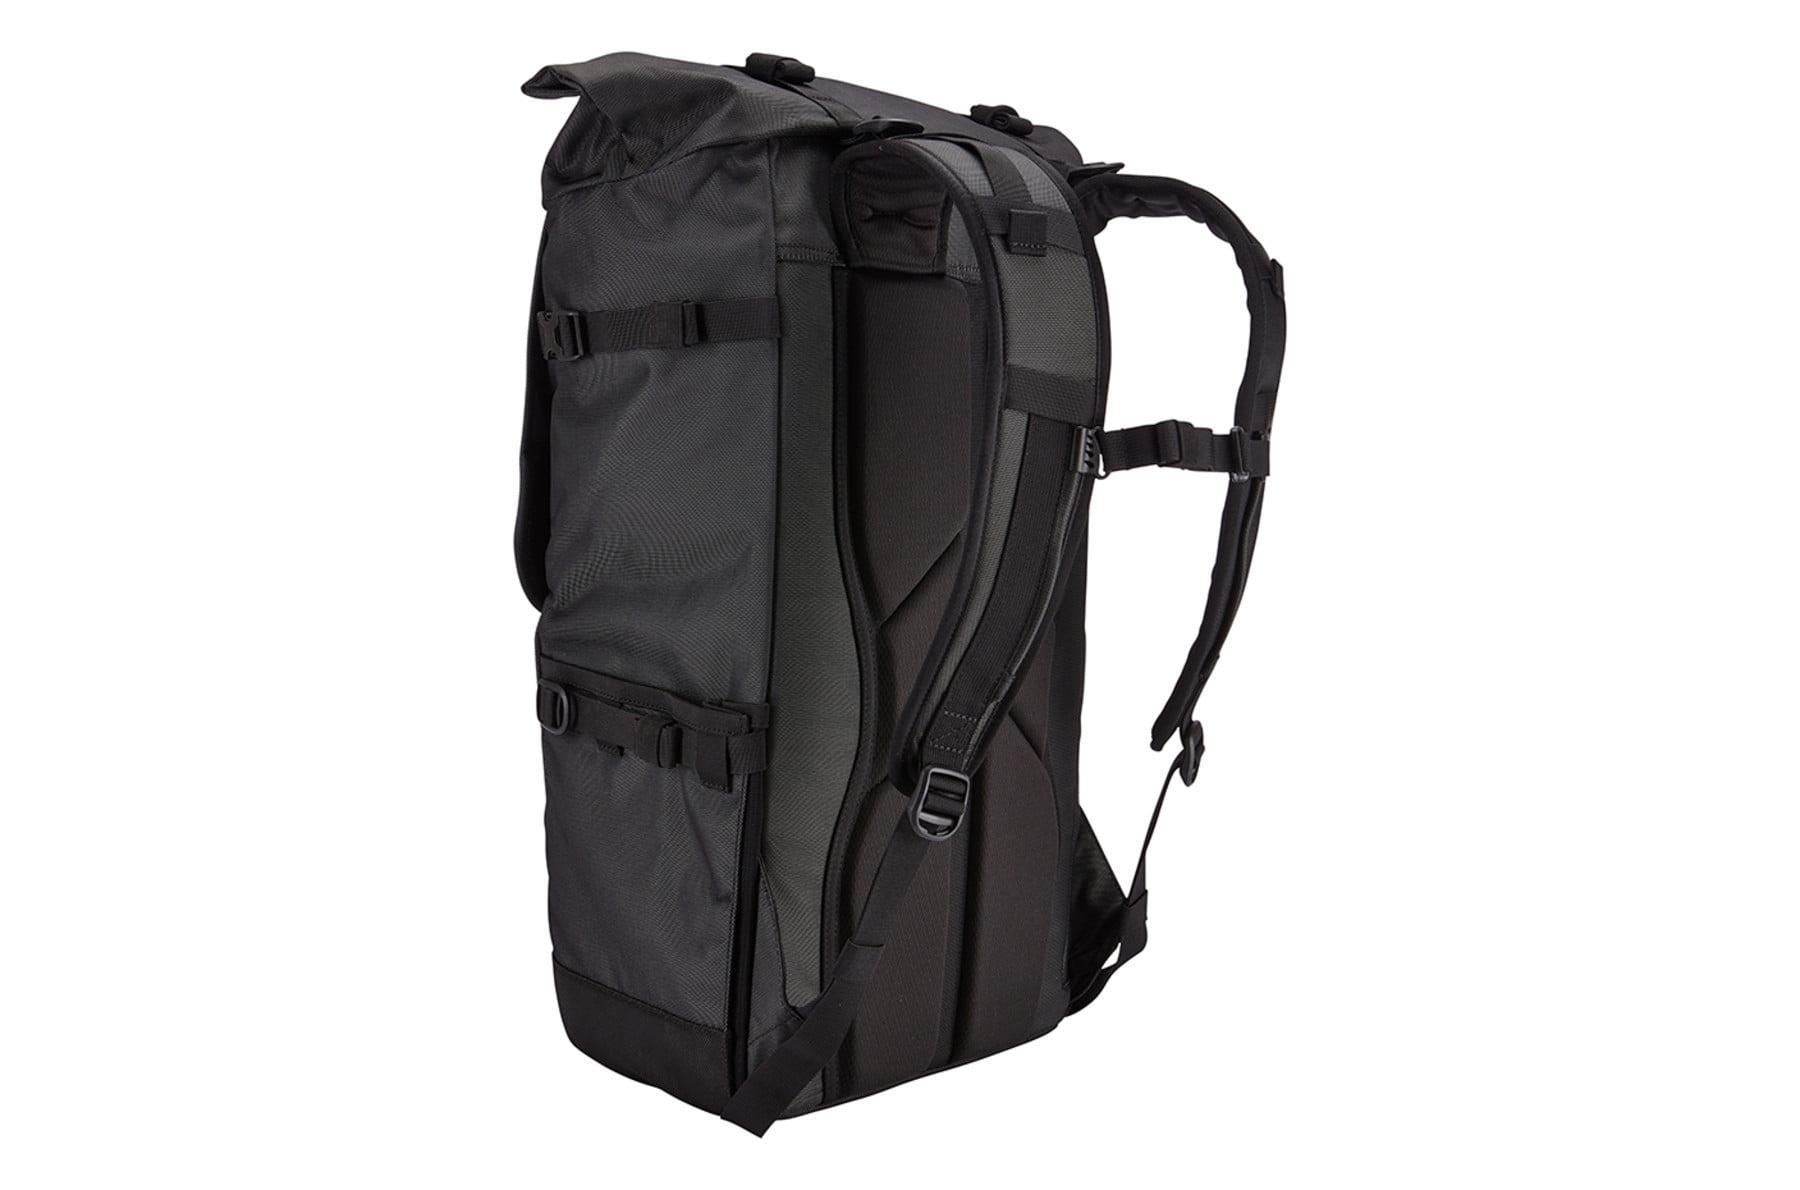 Rucsac foto Thule Covert DSLR Backpack Dark Shadow 3